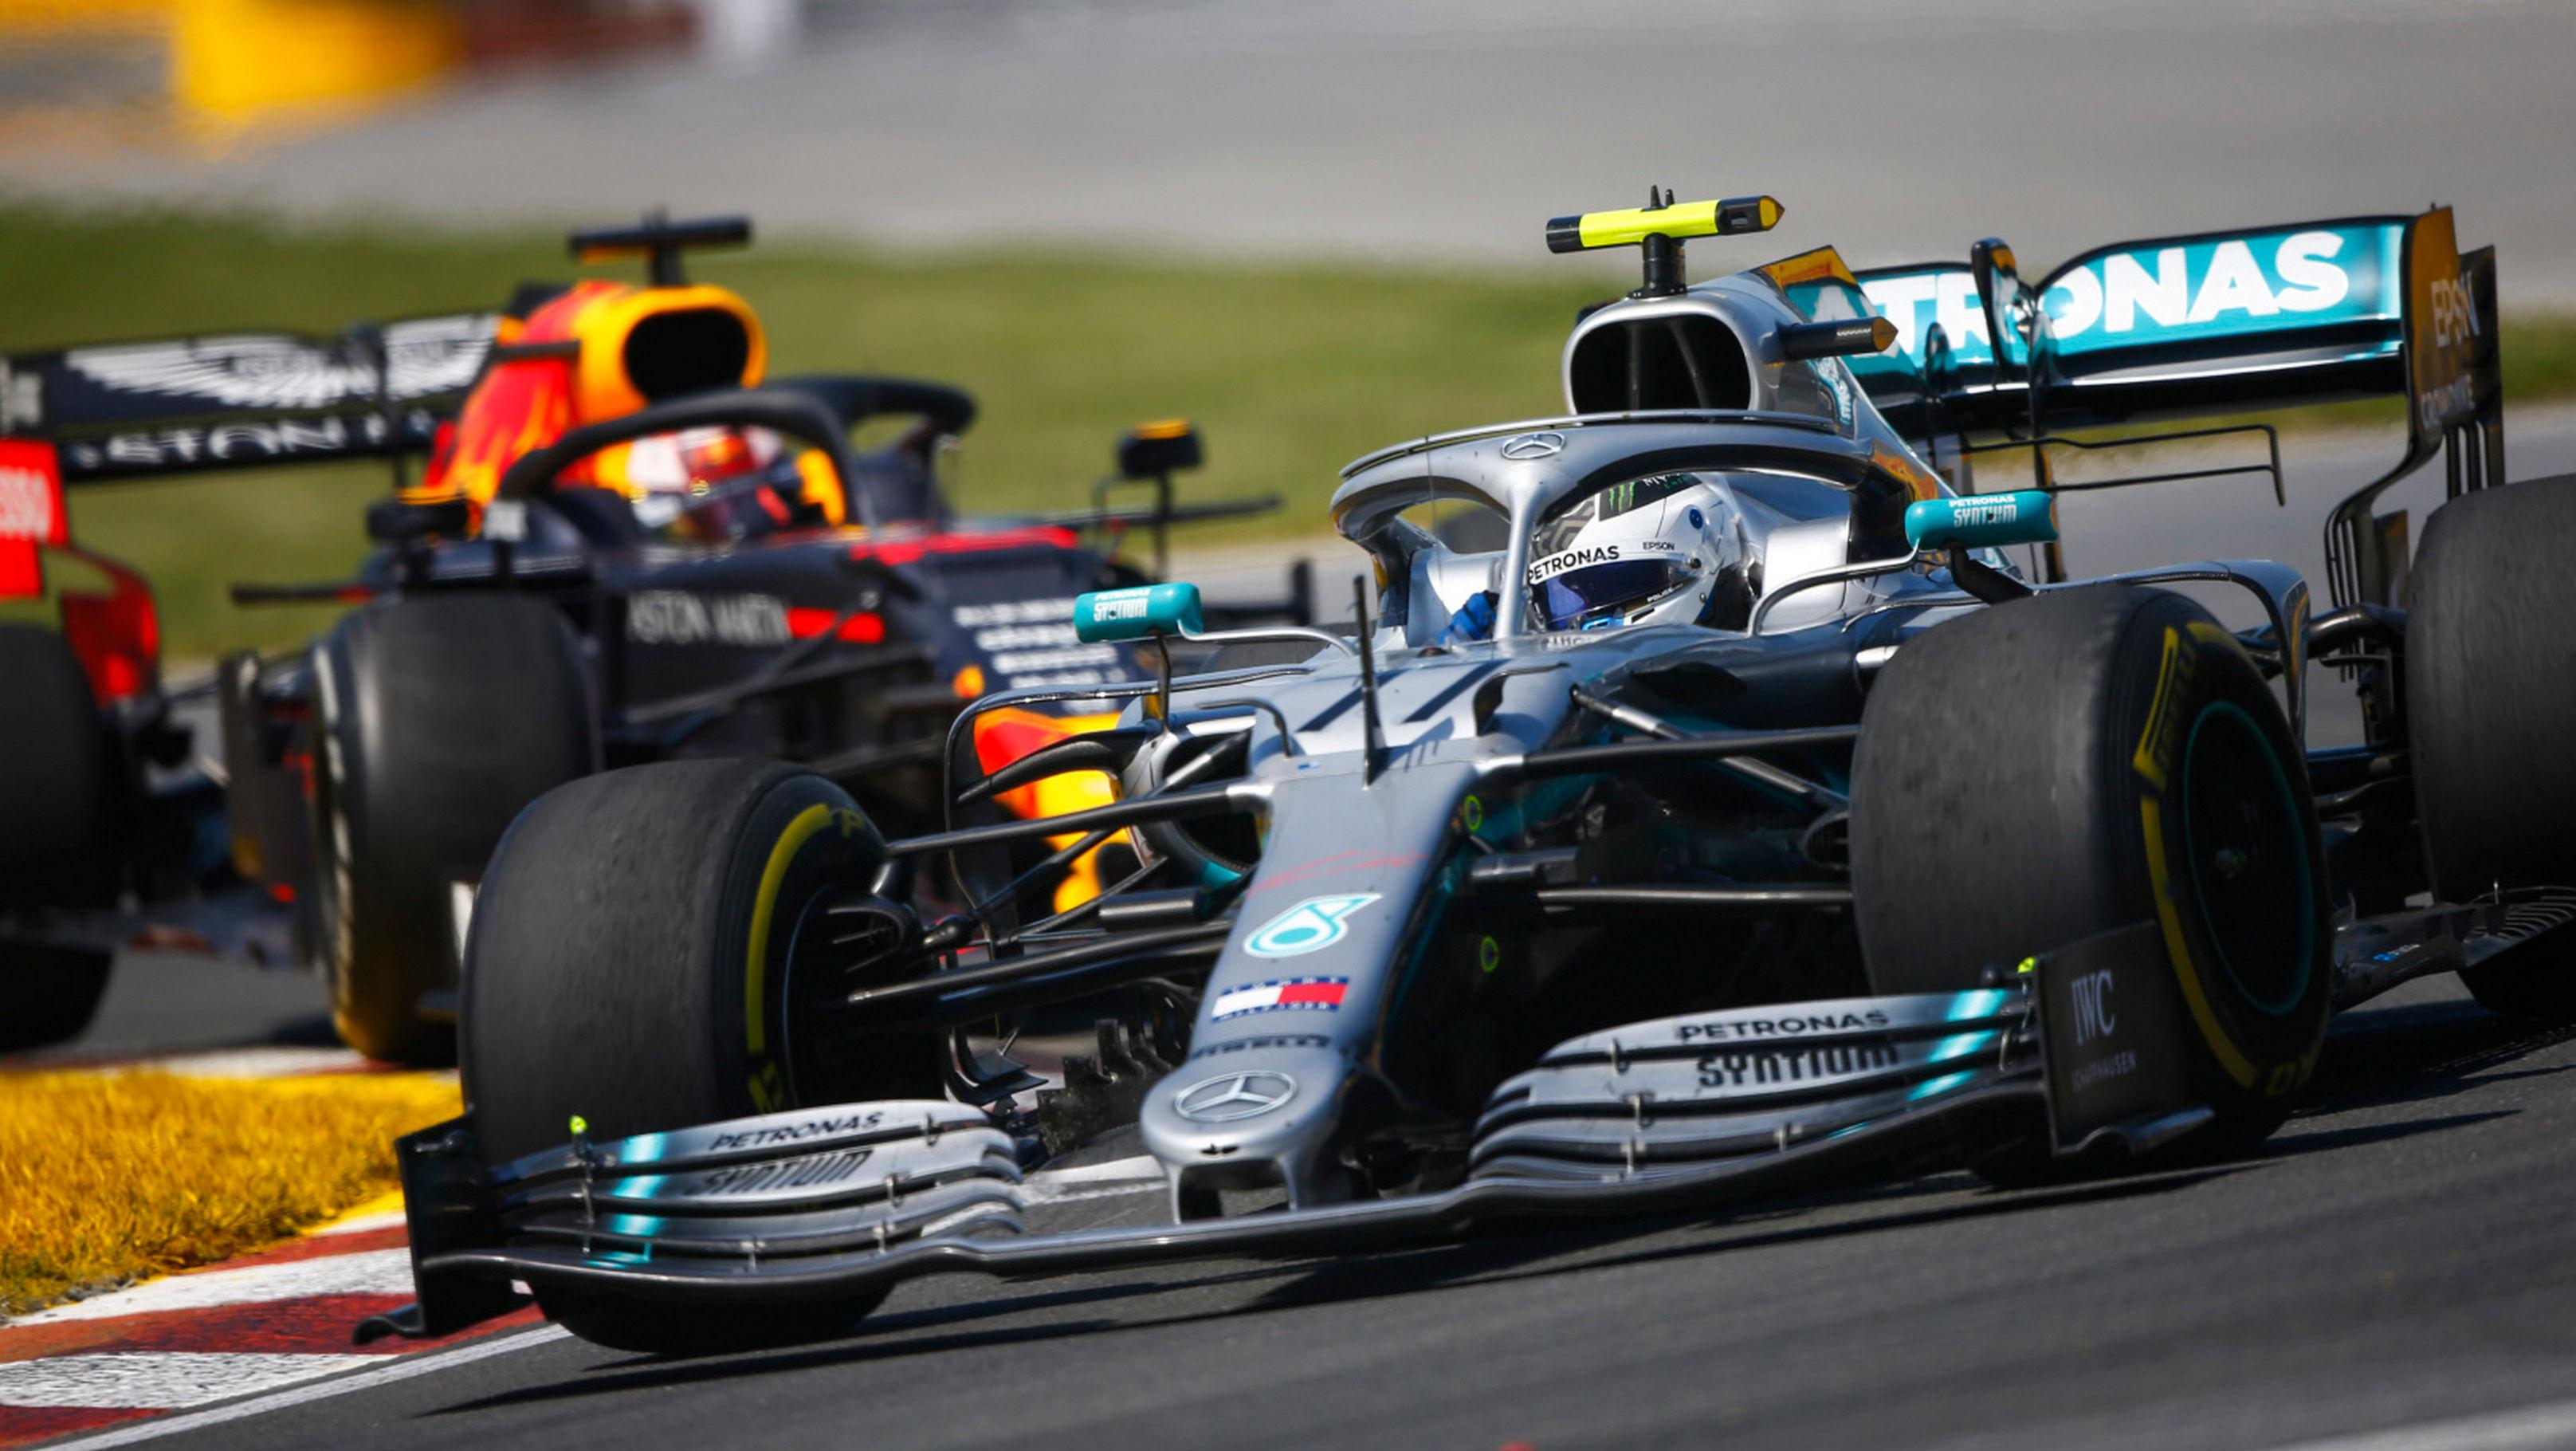 penalize Sebastian Vettel